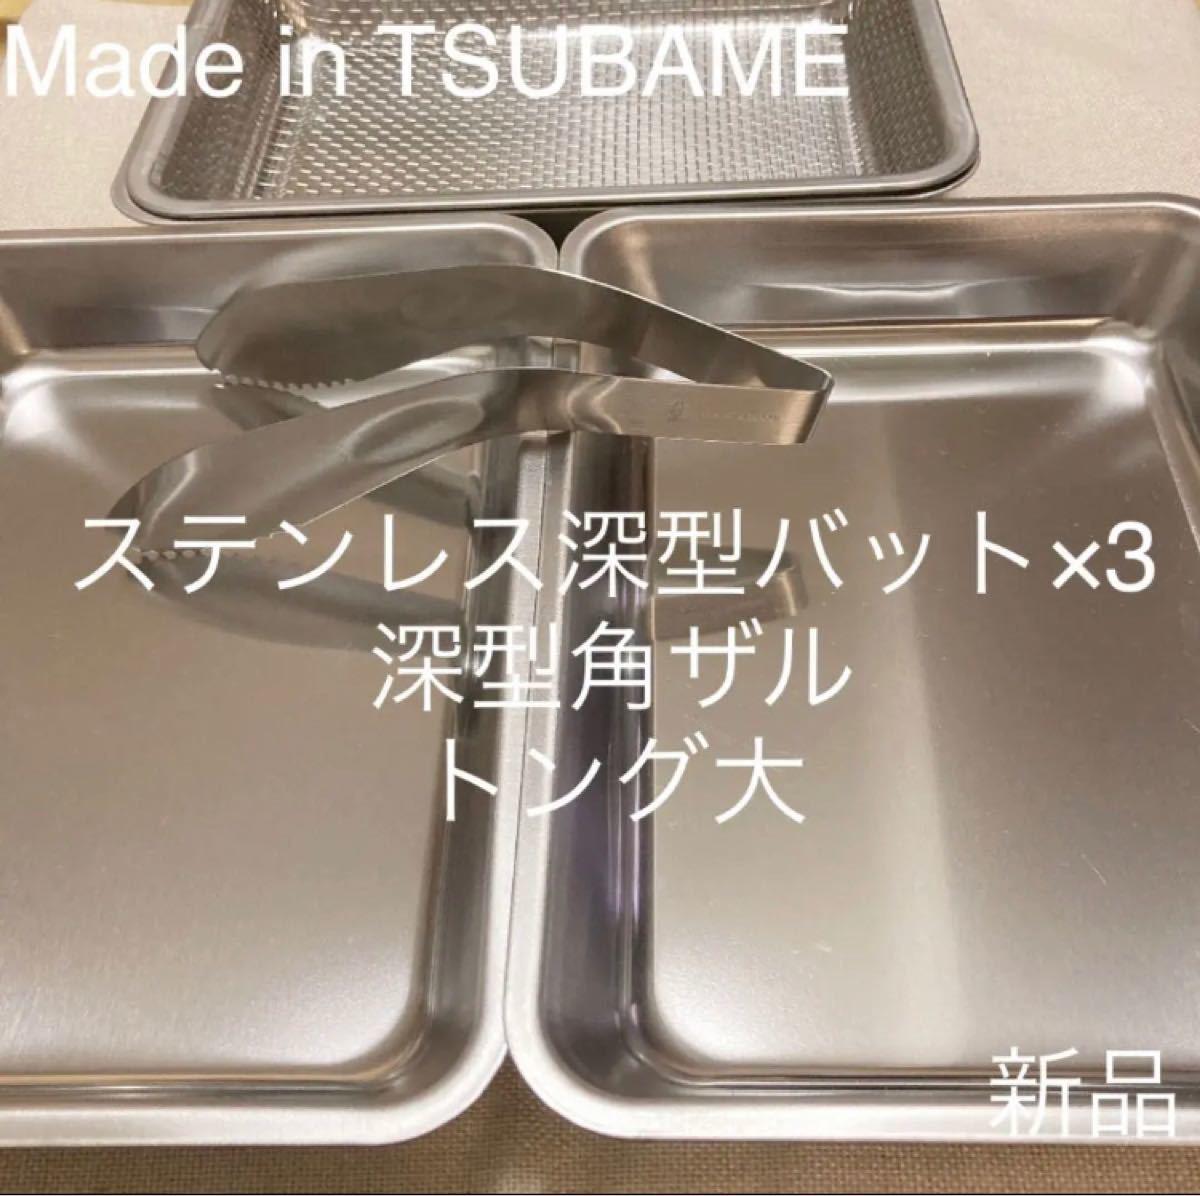 MADE in TSUBAME ステンレス深型バット×3+角ザル+トング 新品 日本製 新潟県燕市燕三条 刻印入り 下ごしらえに